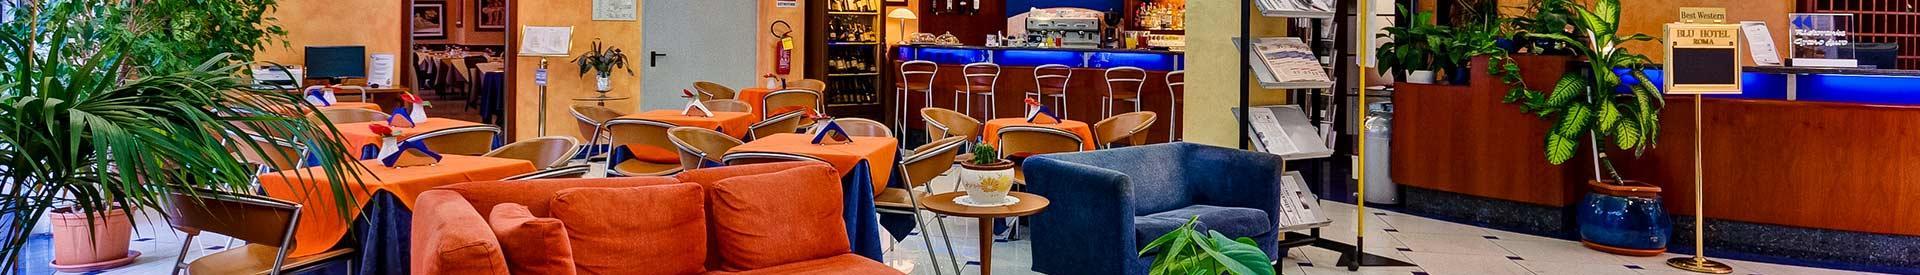 Blu Hotel Roma 4 stelle - Best Western Italia - I Servizi ...